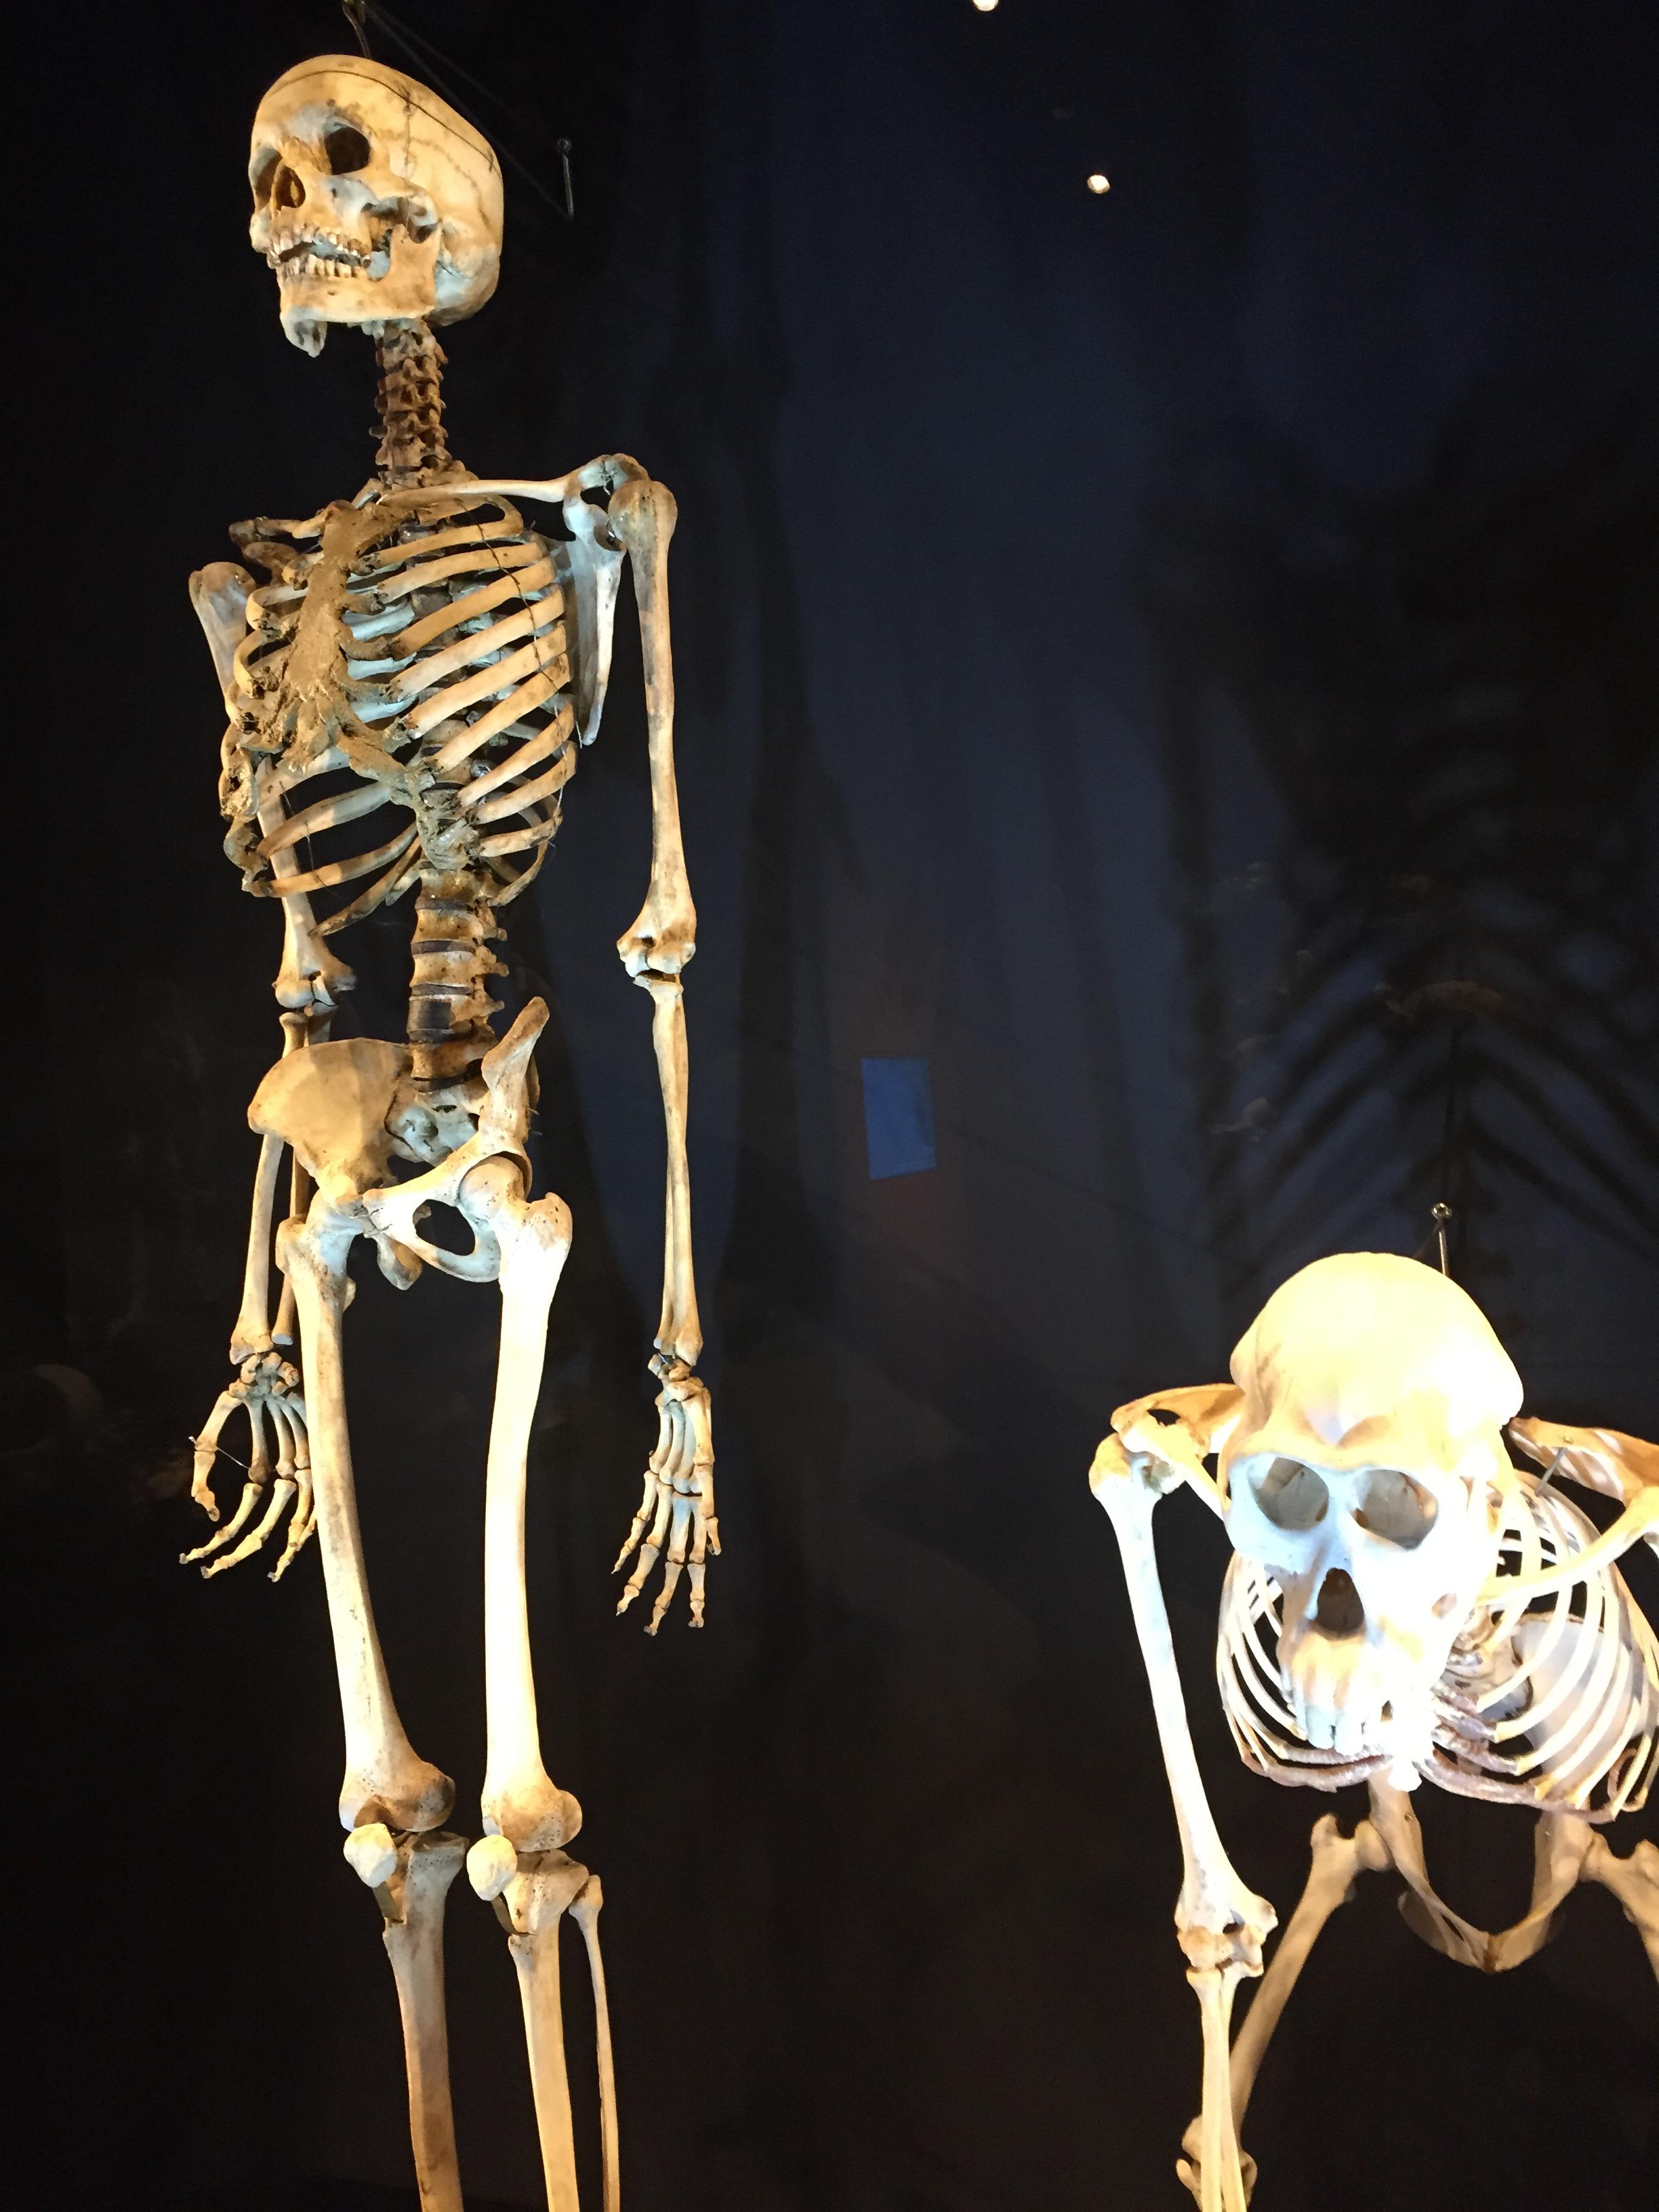 File Skeletons Of A Male Human  Homo Sapiens  And A Bornean Orangutan  Pongo Pygmaeus   Lee Kong